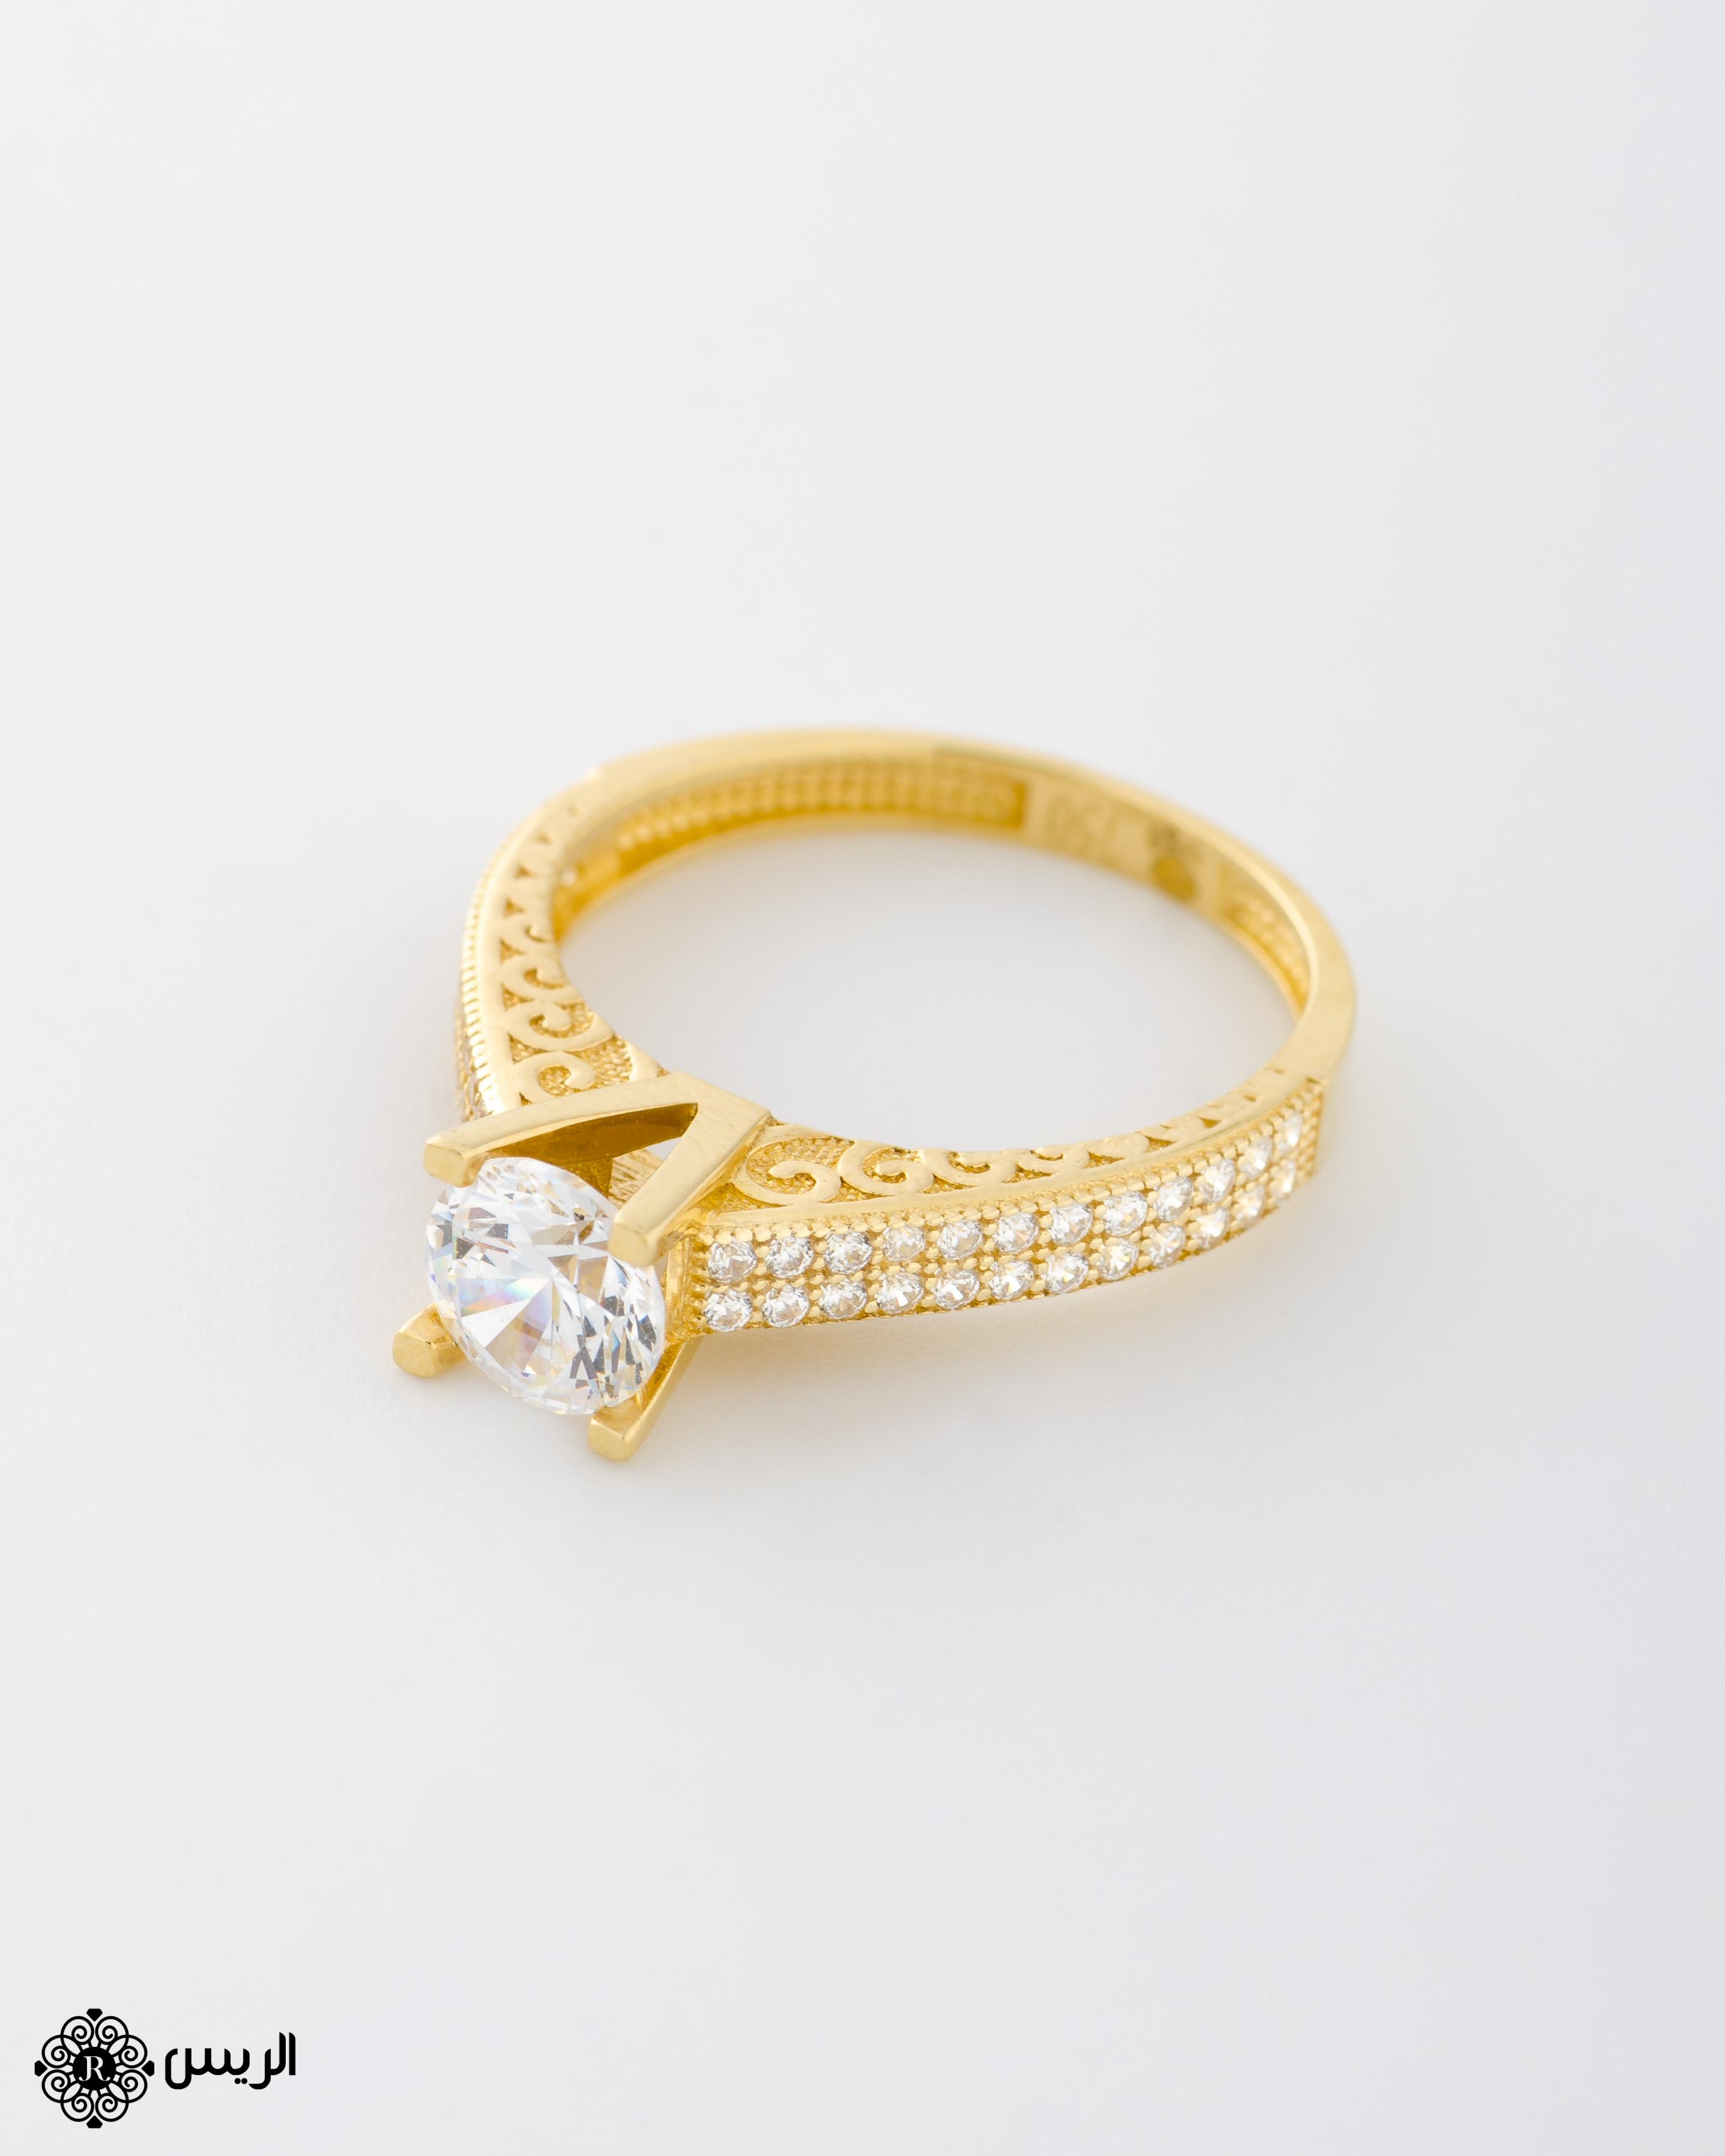 Raies jewelry Solitaire Ring خاتم سوليتير الريس للمجوهرات